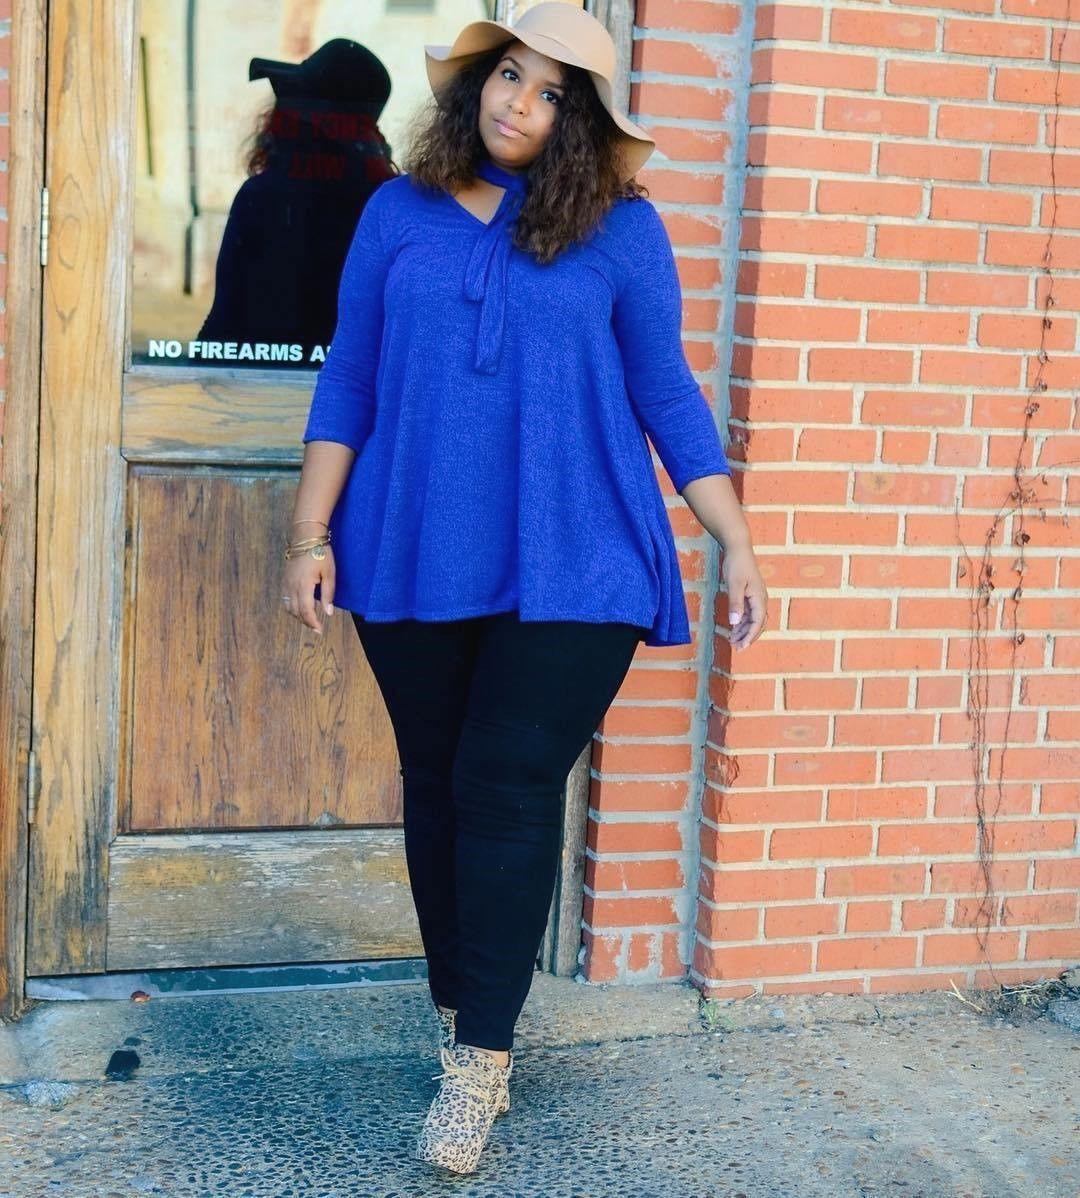 Bloger fashion ngoại cỡ